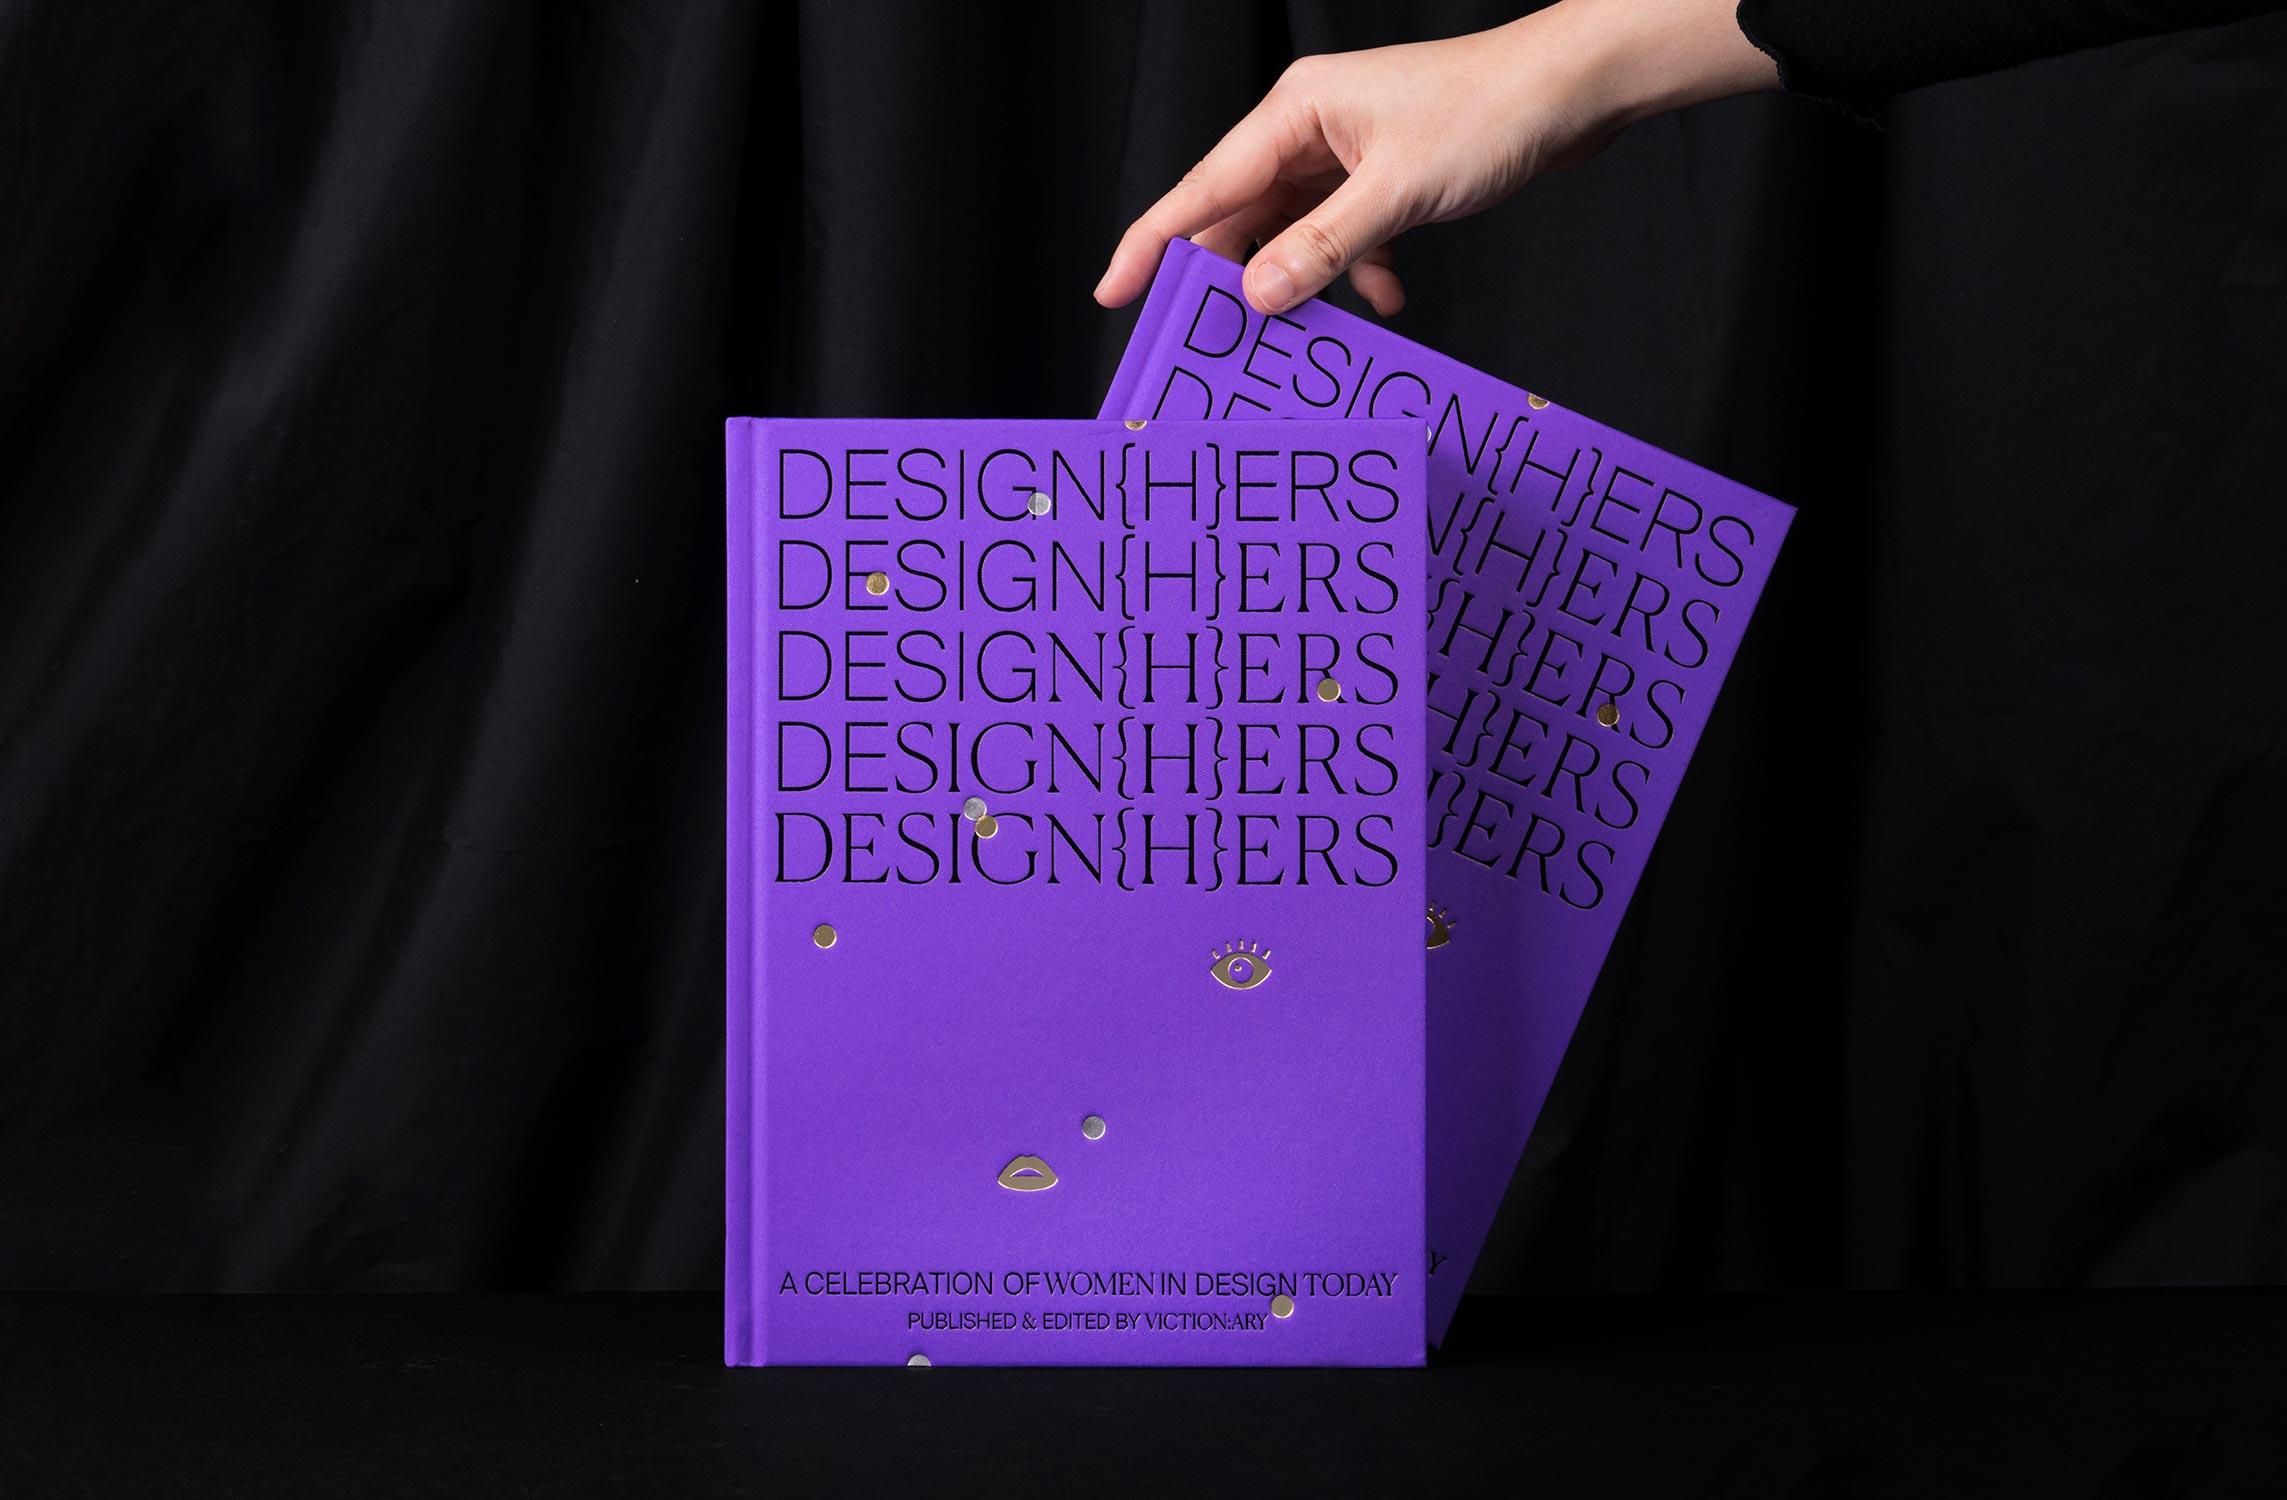 designhers.jpg